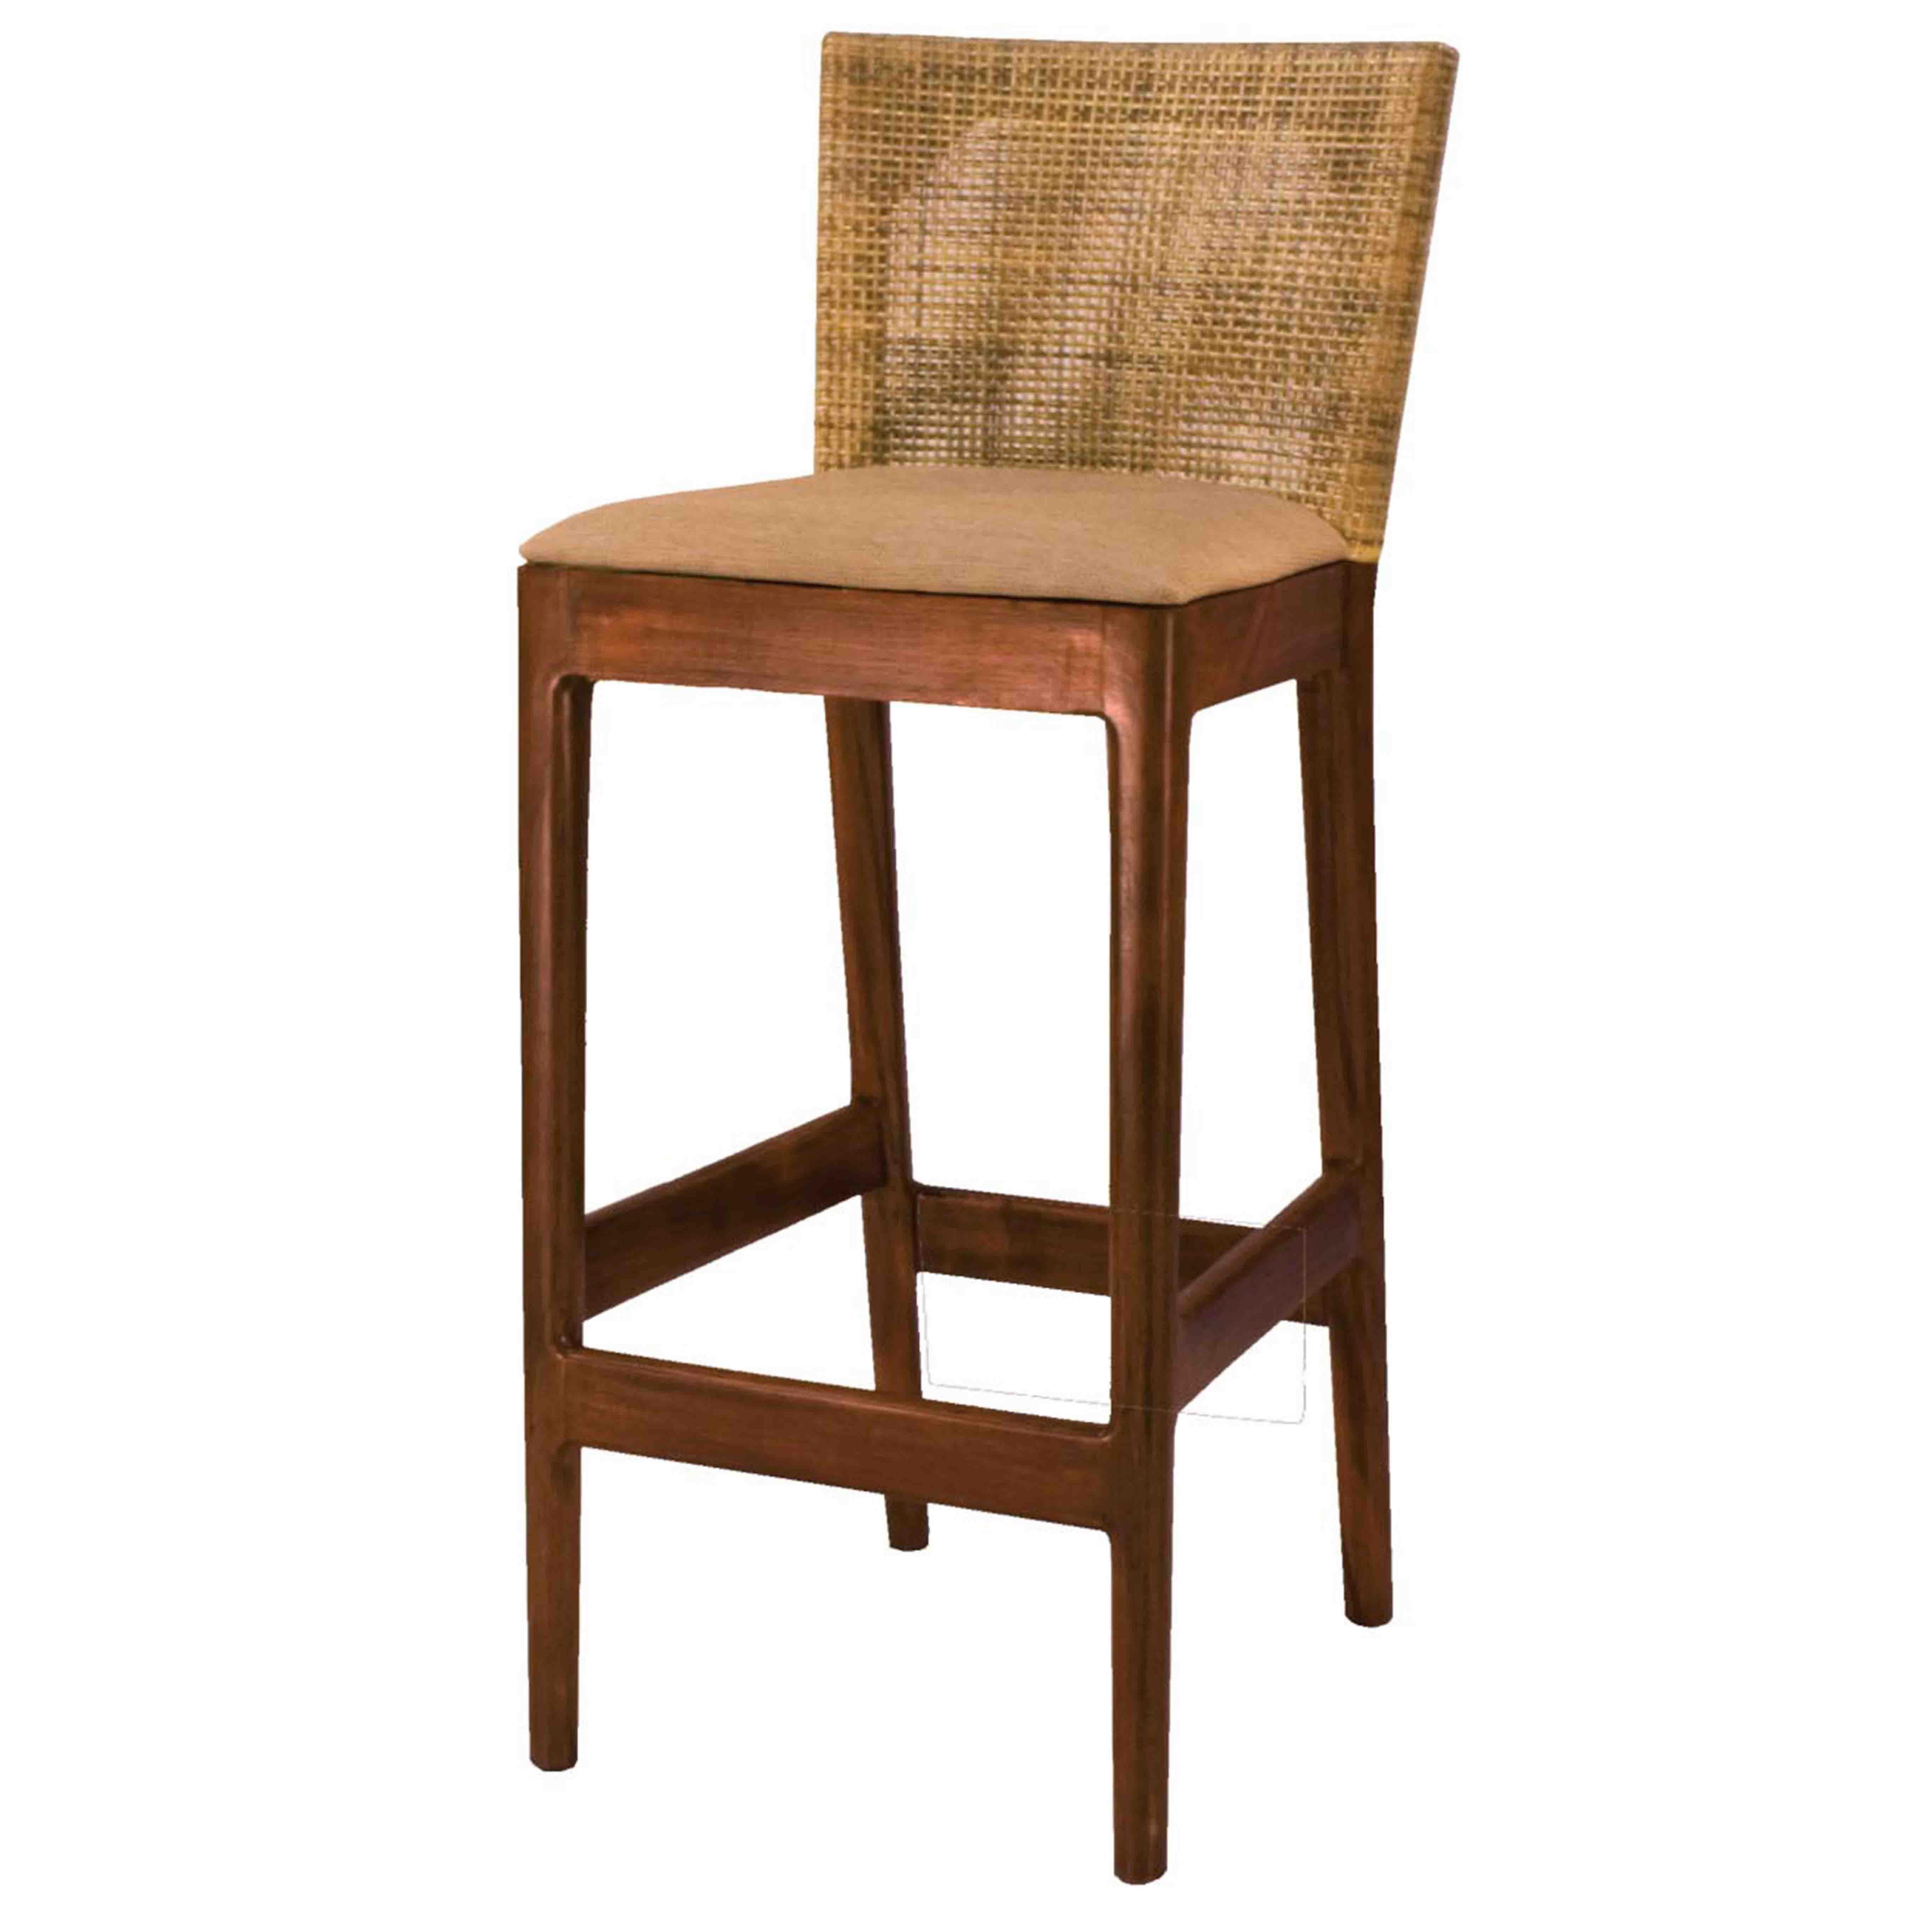 878525 229 Npd Home Furniture Wholesale Lifestyle